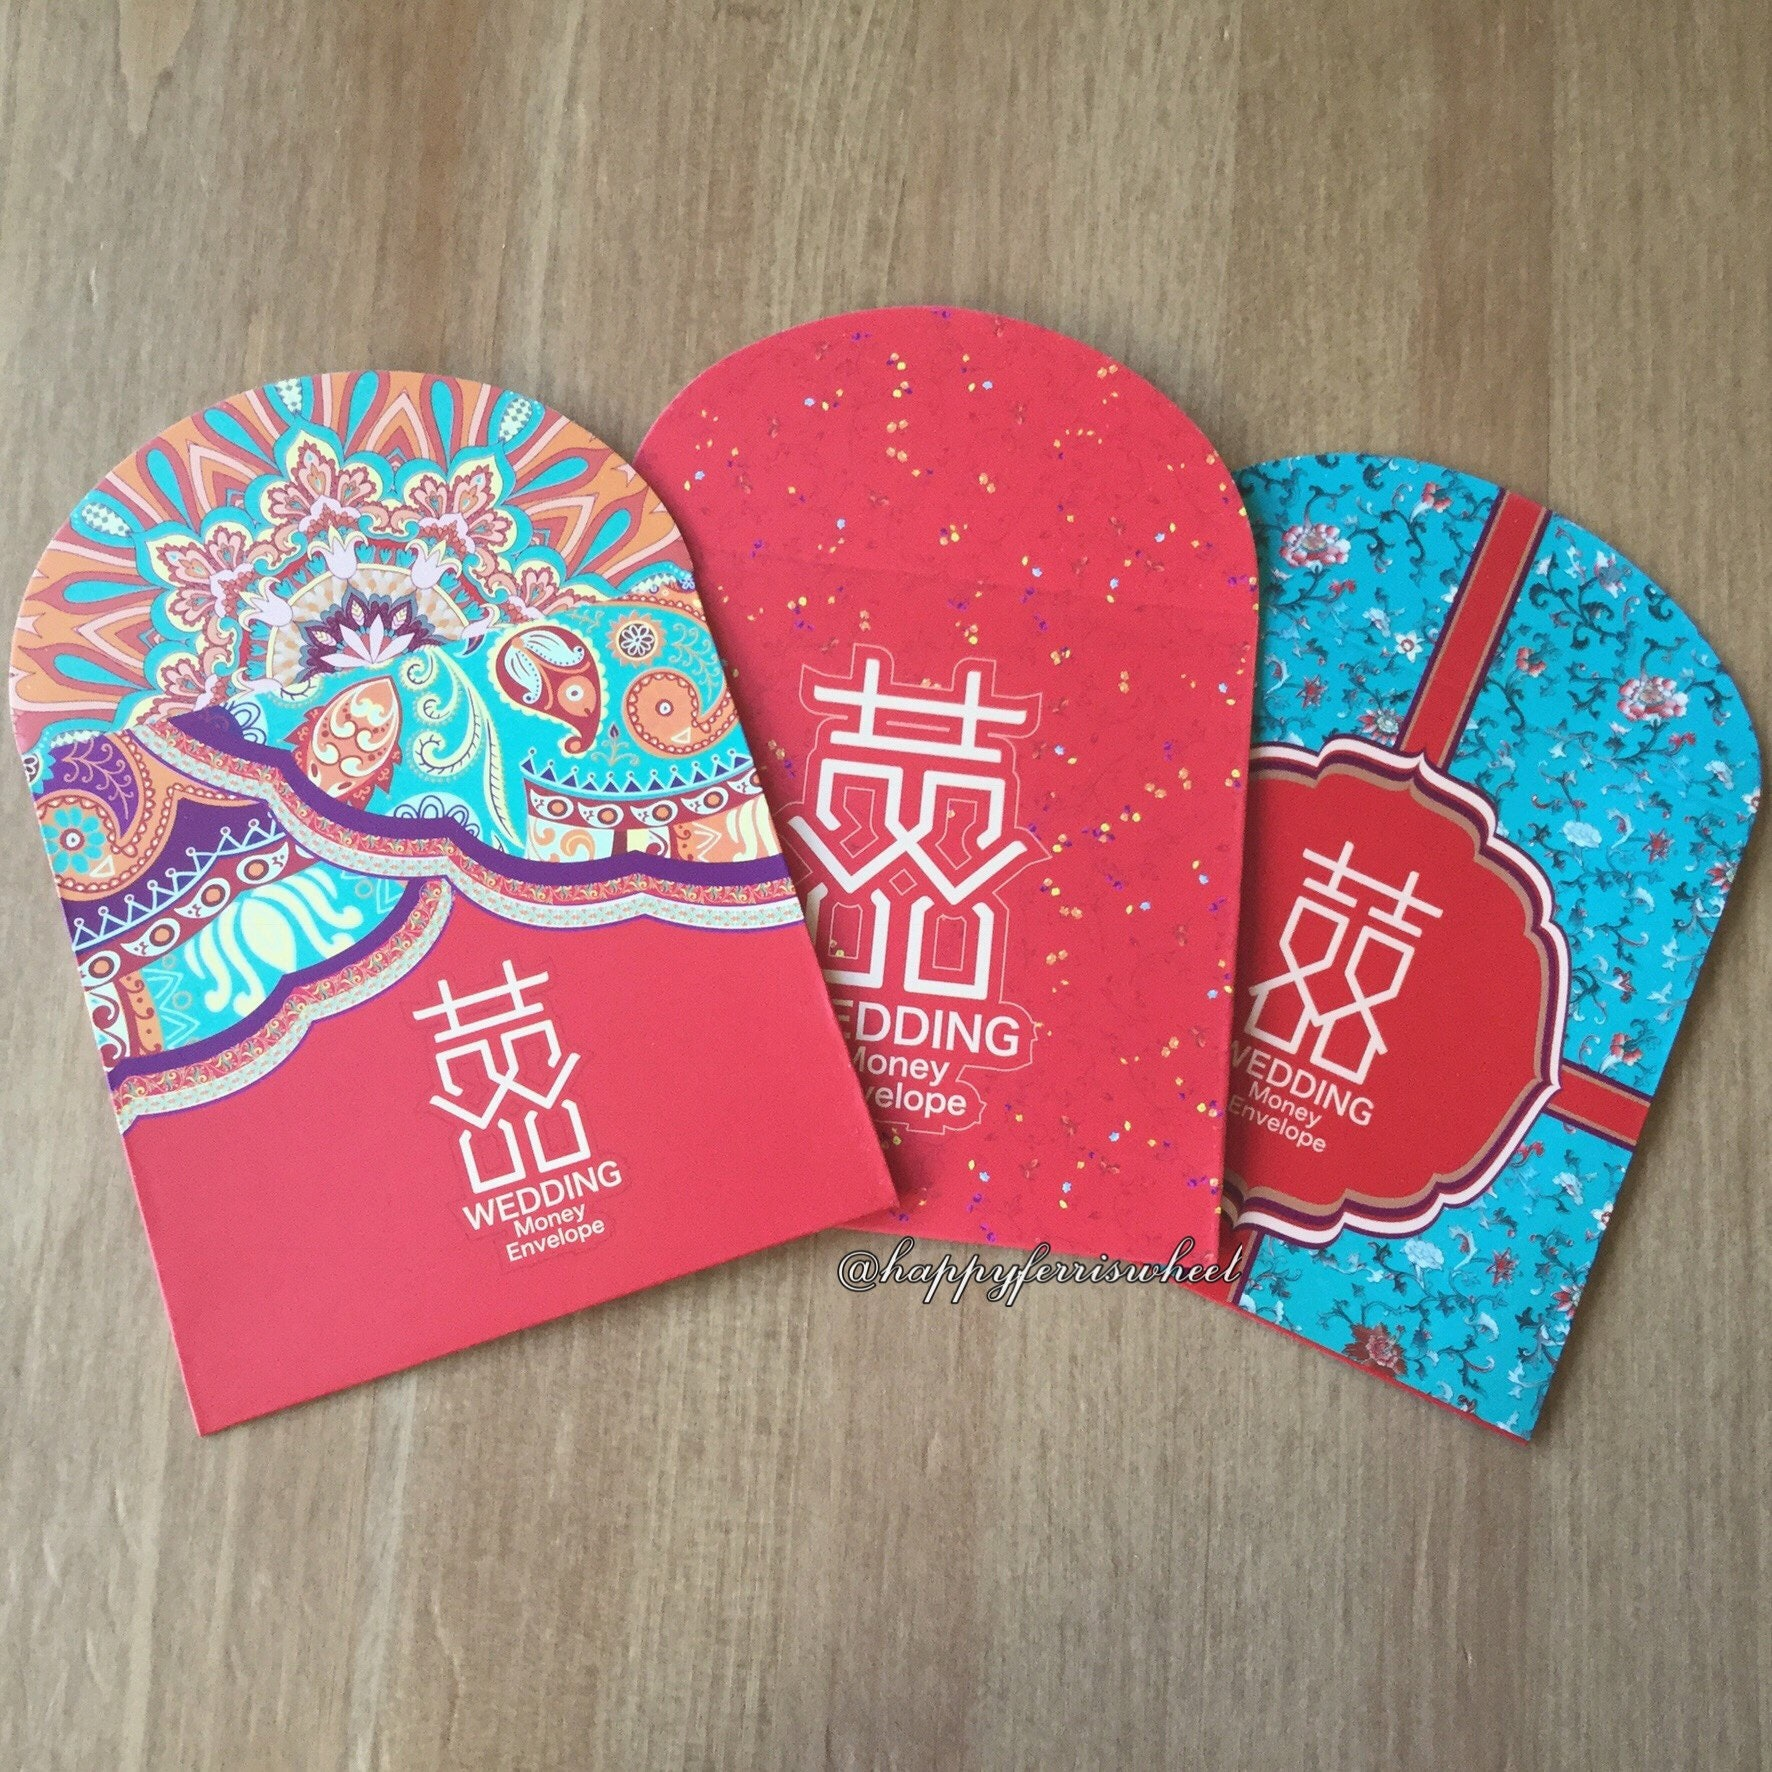 Square-shaped Wedding Money Envelopes Traditional Chinese